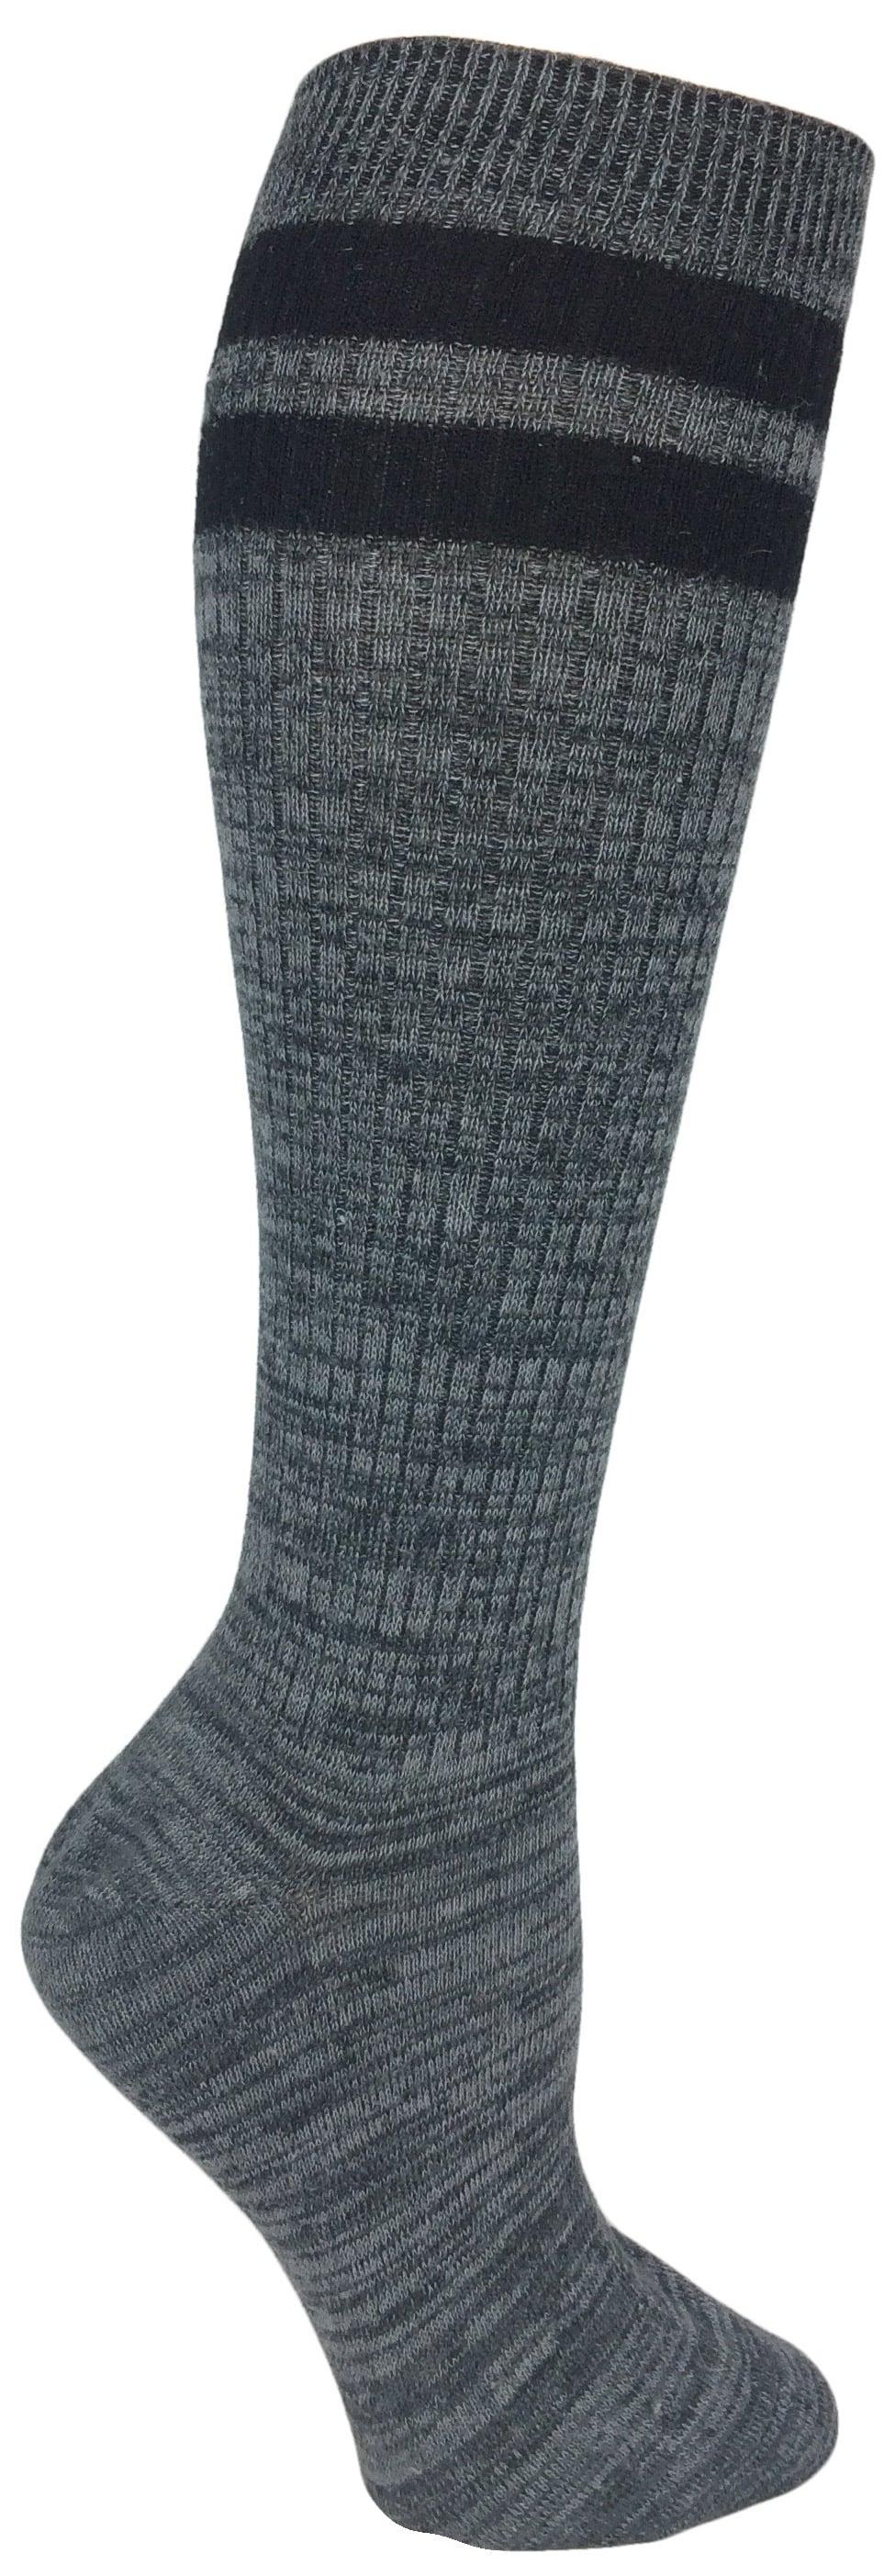 sock8.jpg